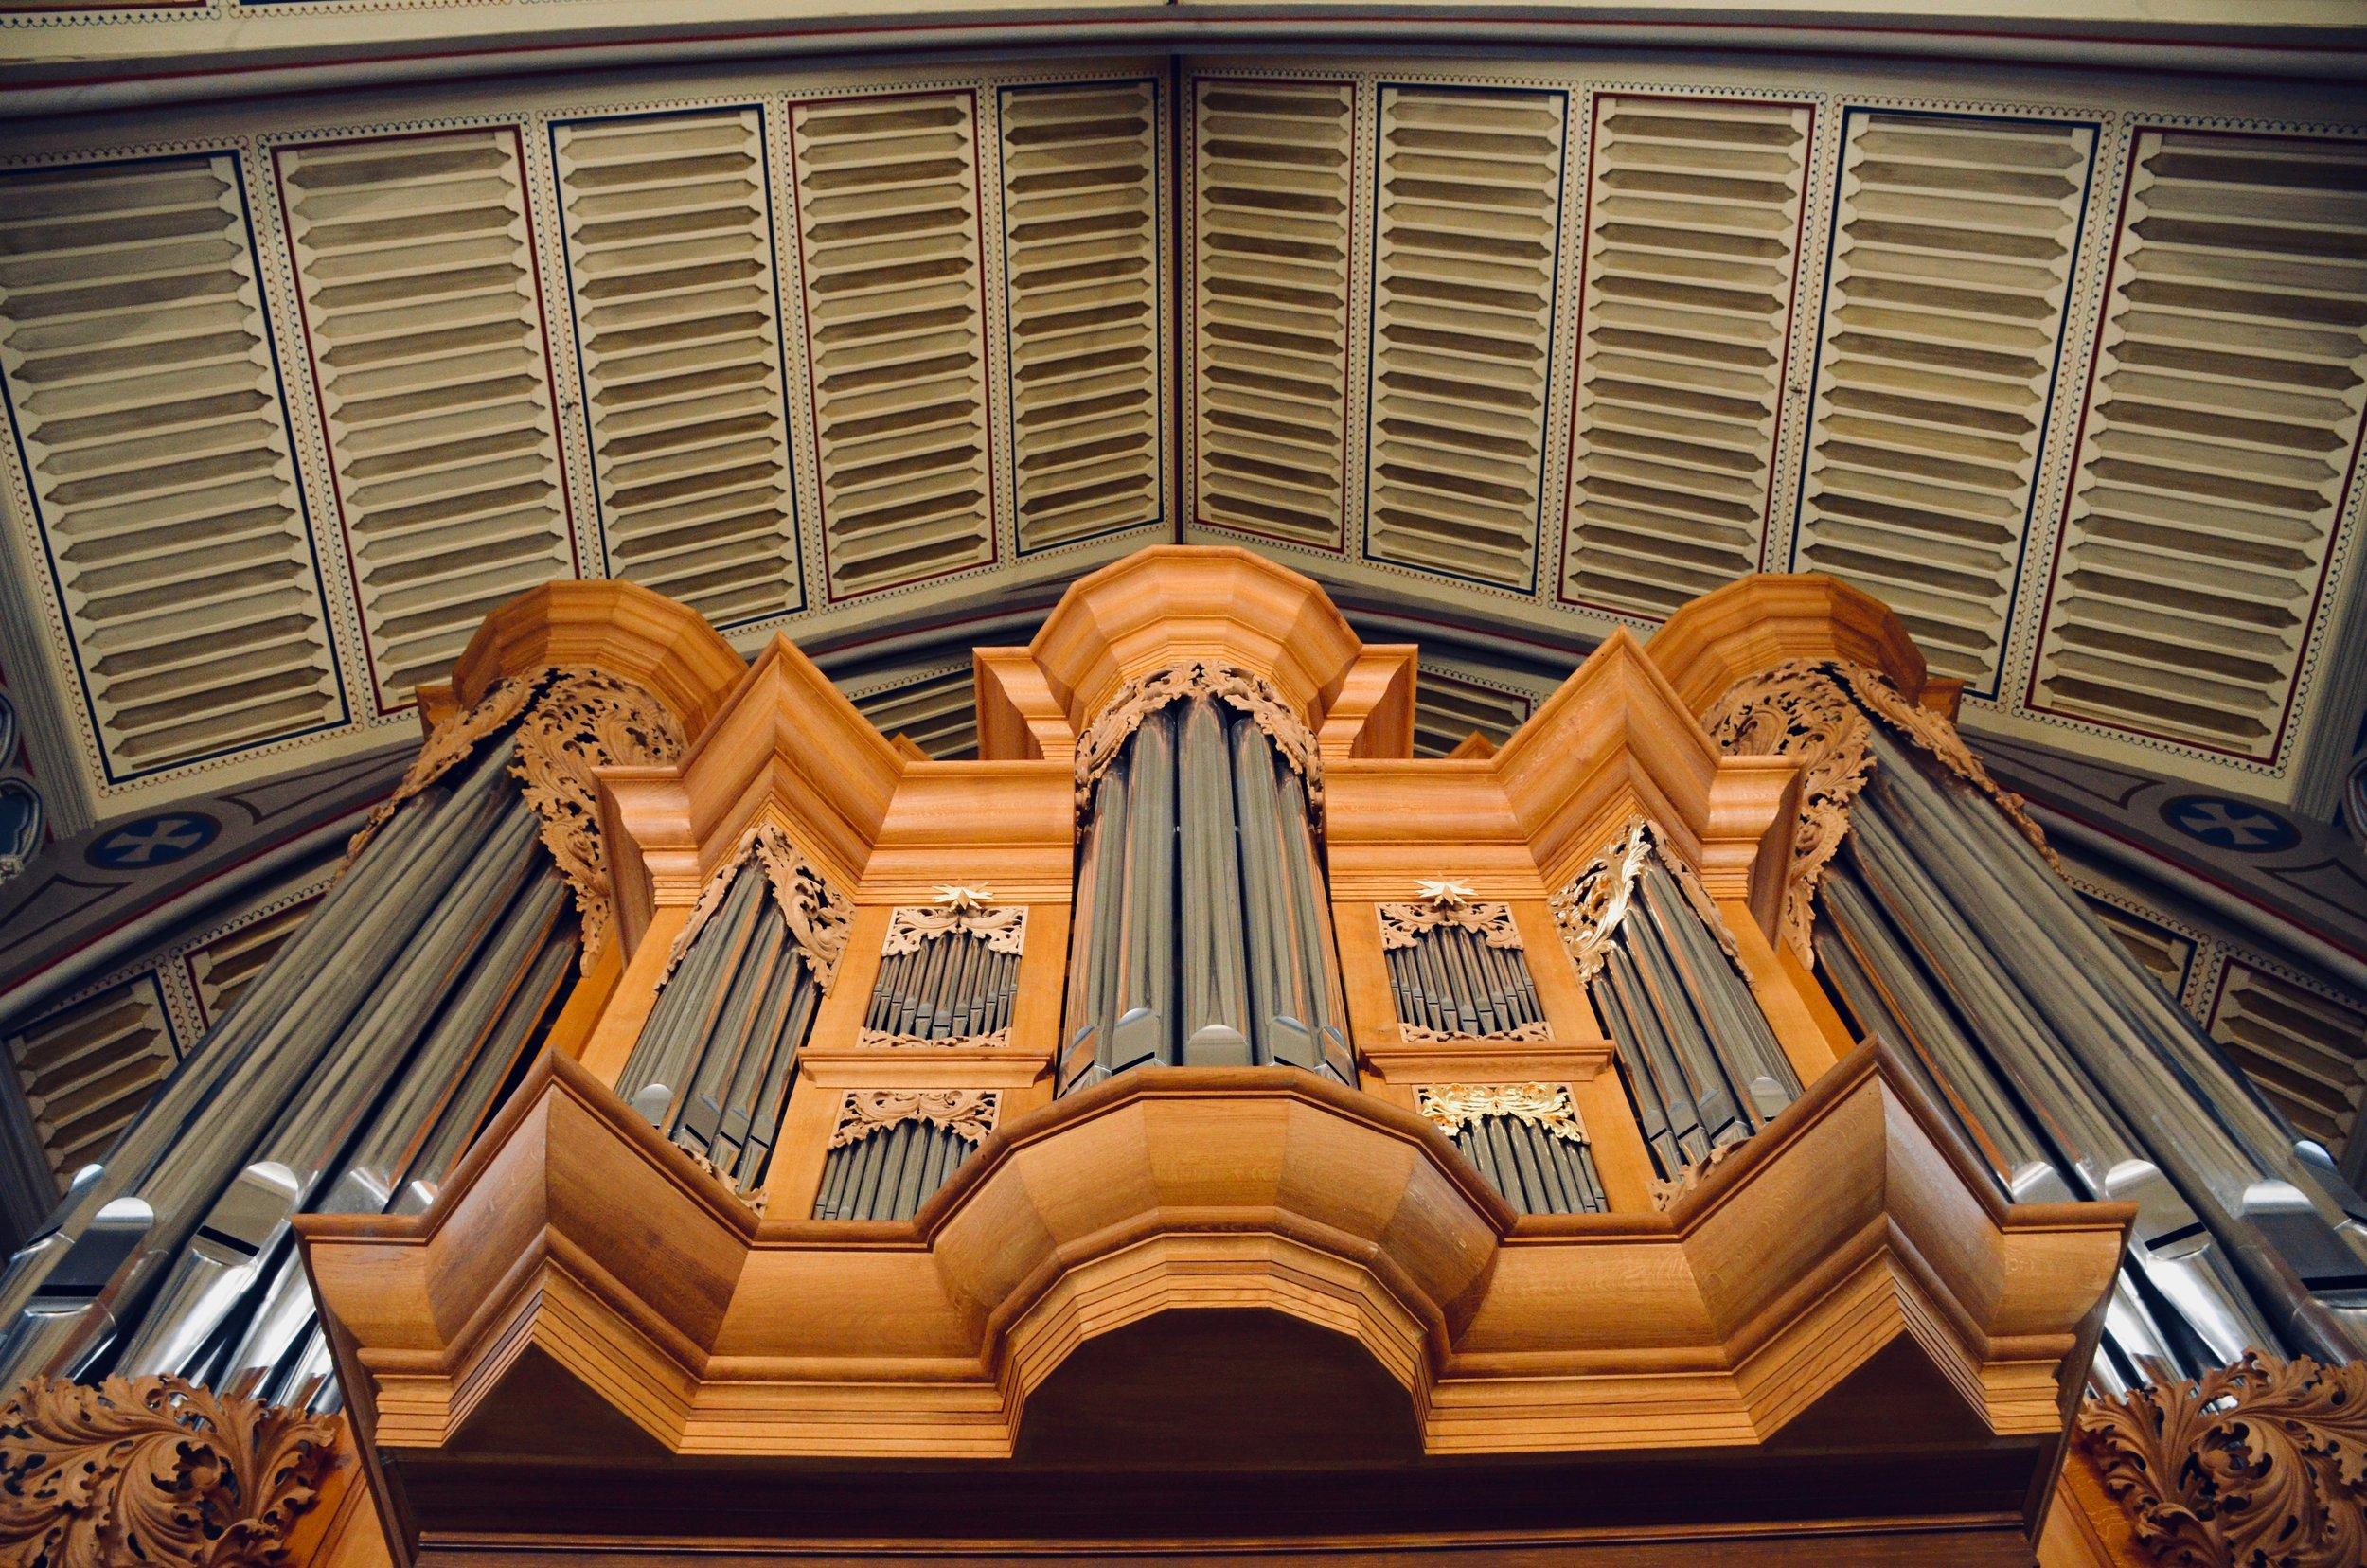 2000 GoART North German Baroque Research Organ in Örgryte New Church, Göteborg, Sweden.